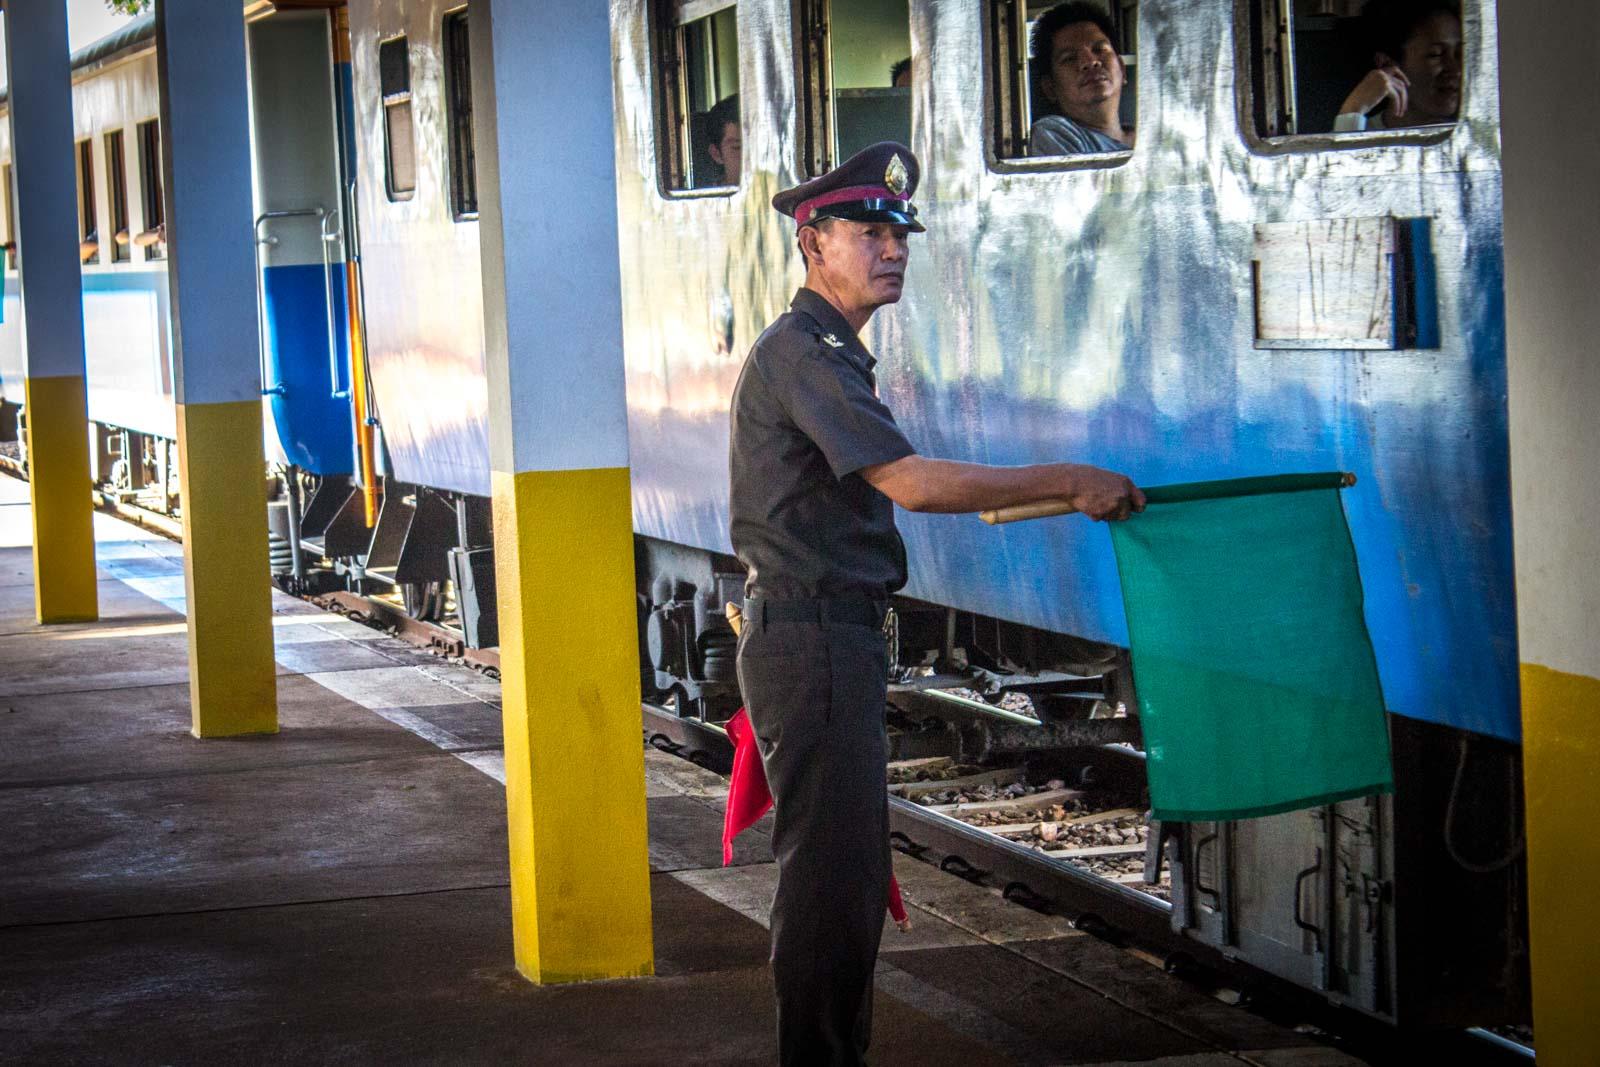 The Burma Thailand Railway, Death Railway, Bridge Over The River Kwai, Kanchanaburi